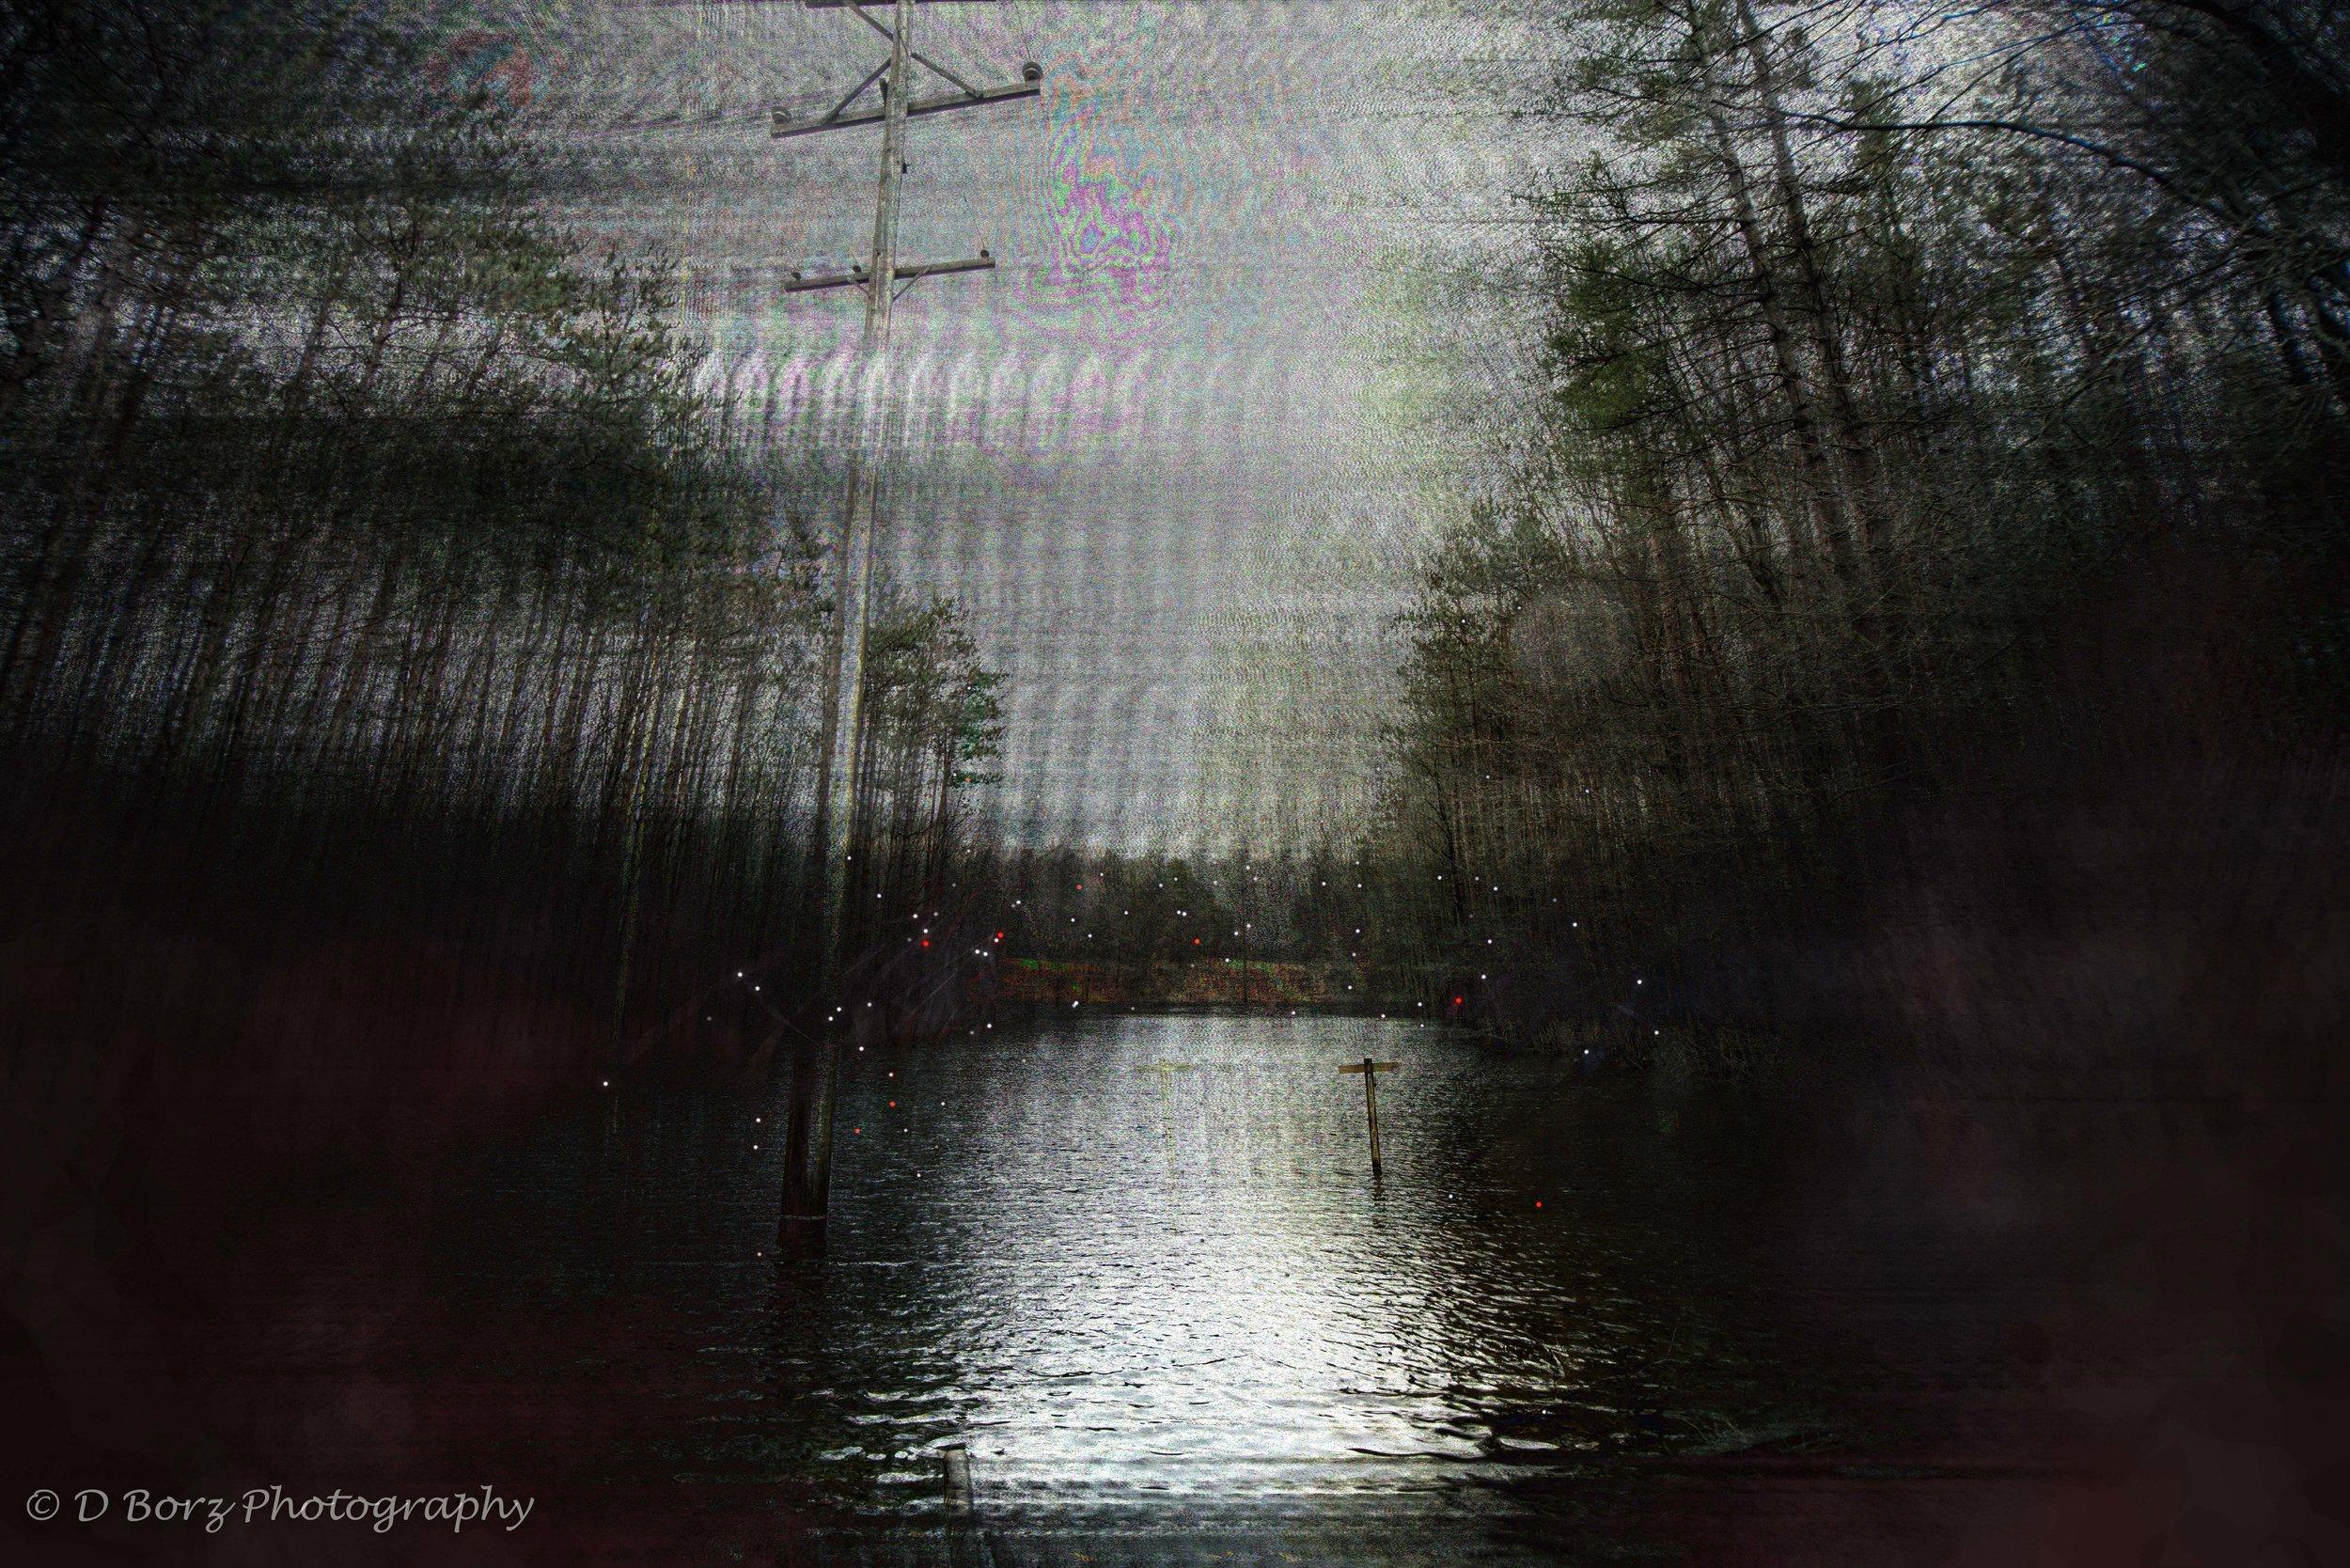 borzkowski_d_soundscape-26.jpg